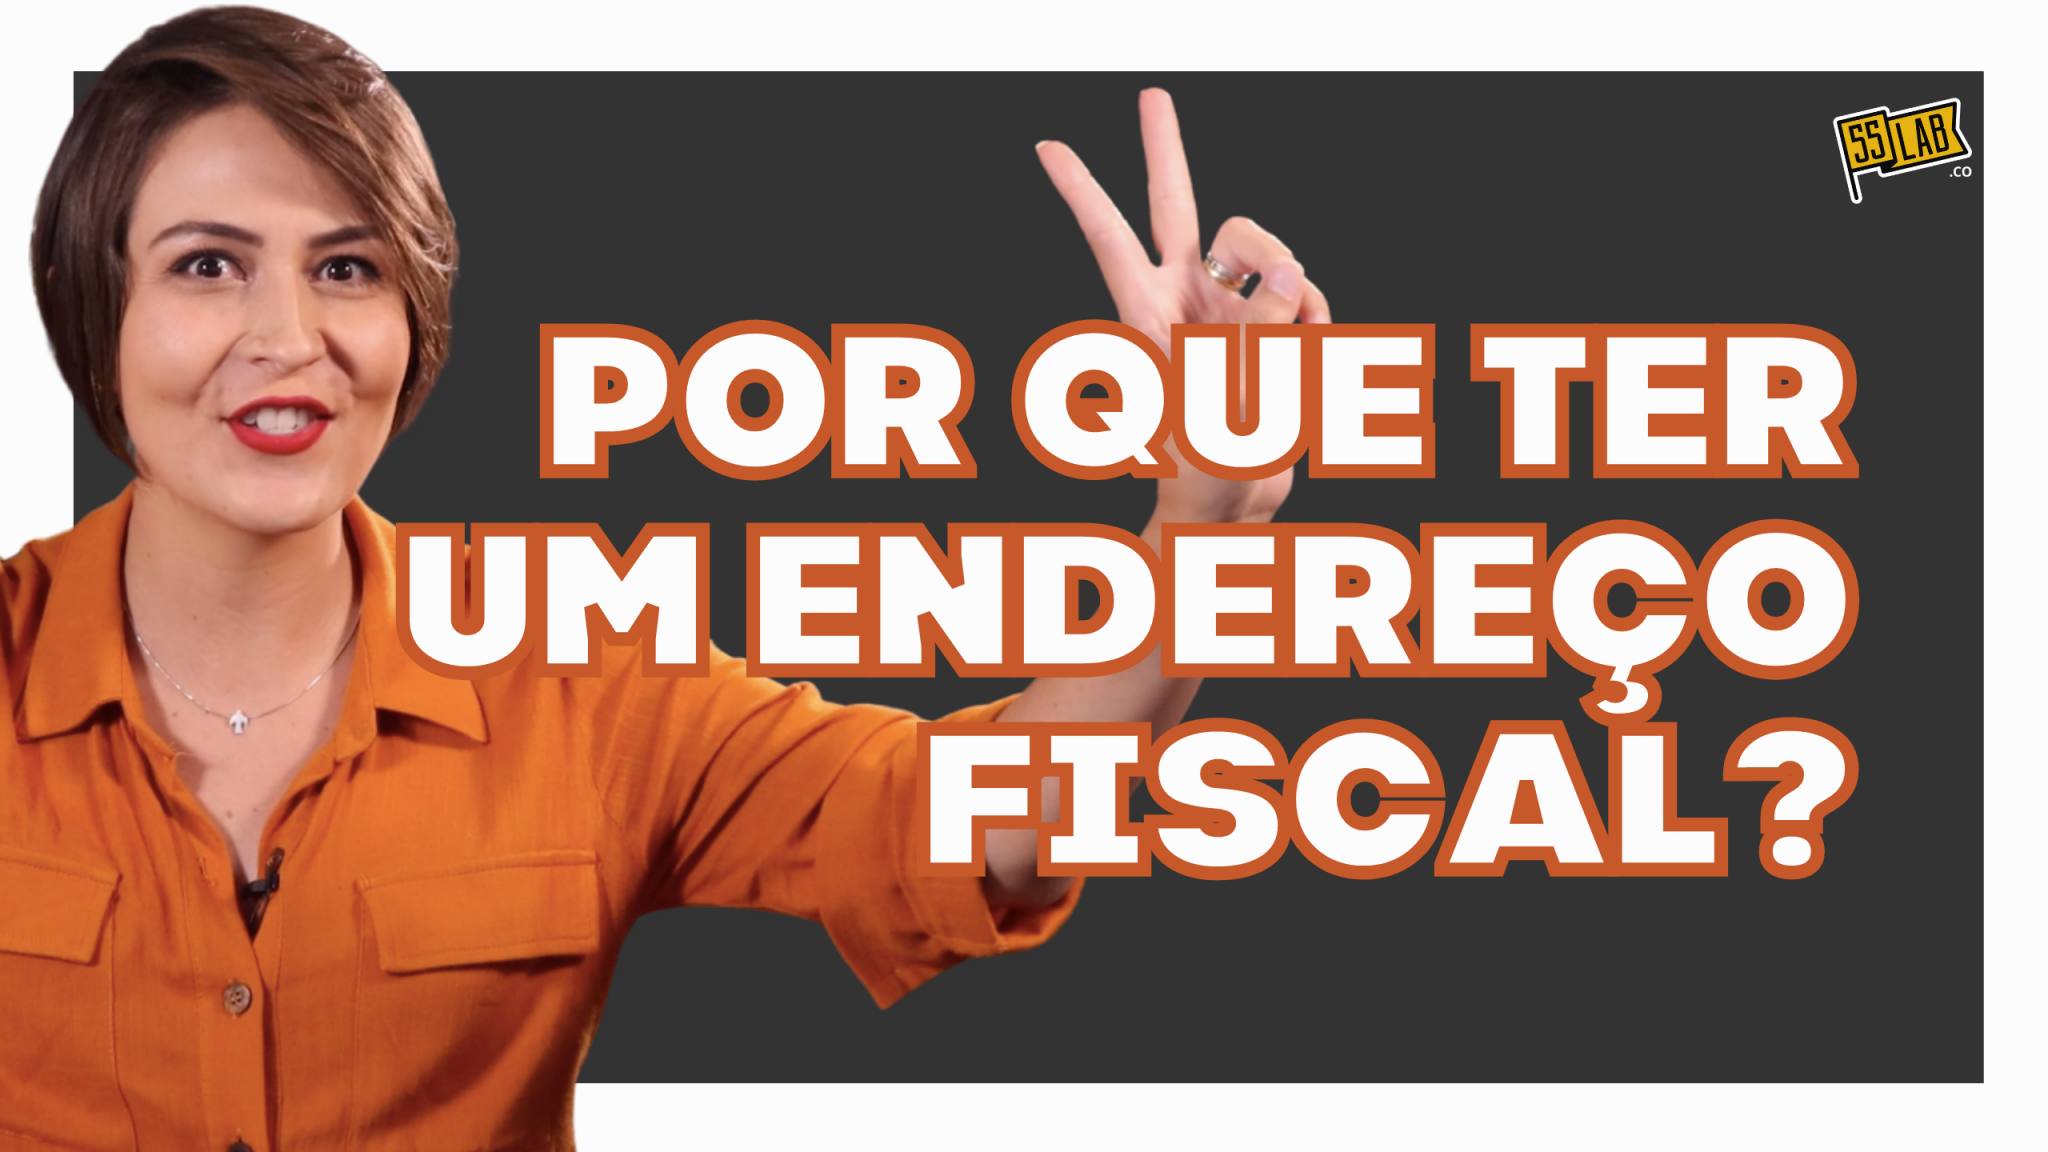 ENDEREÇO FISCAL